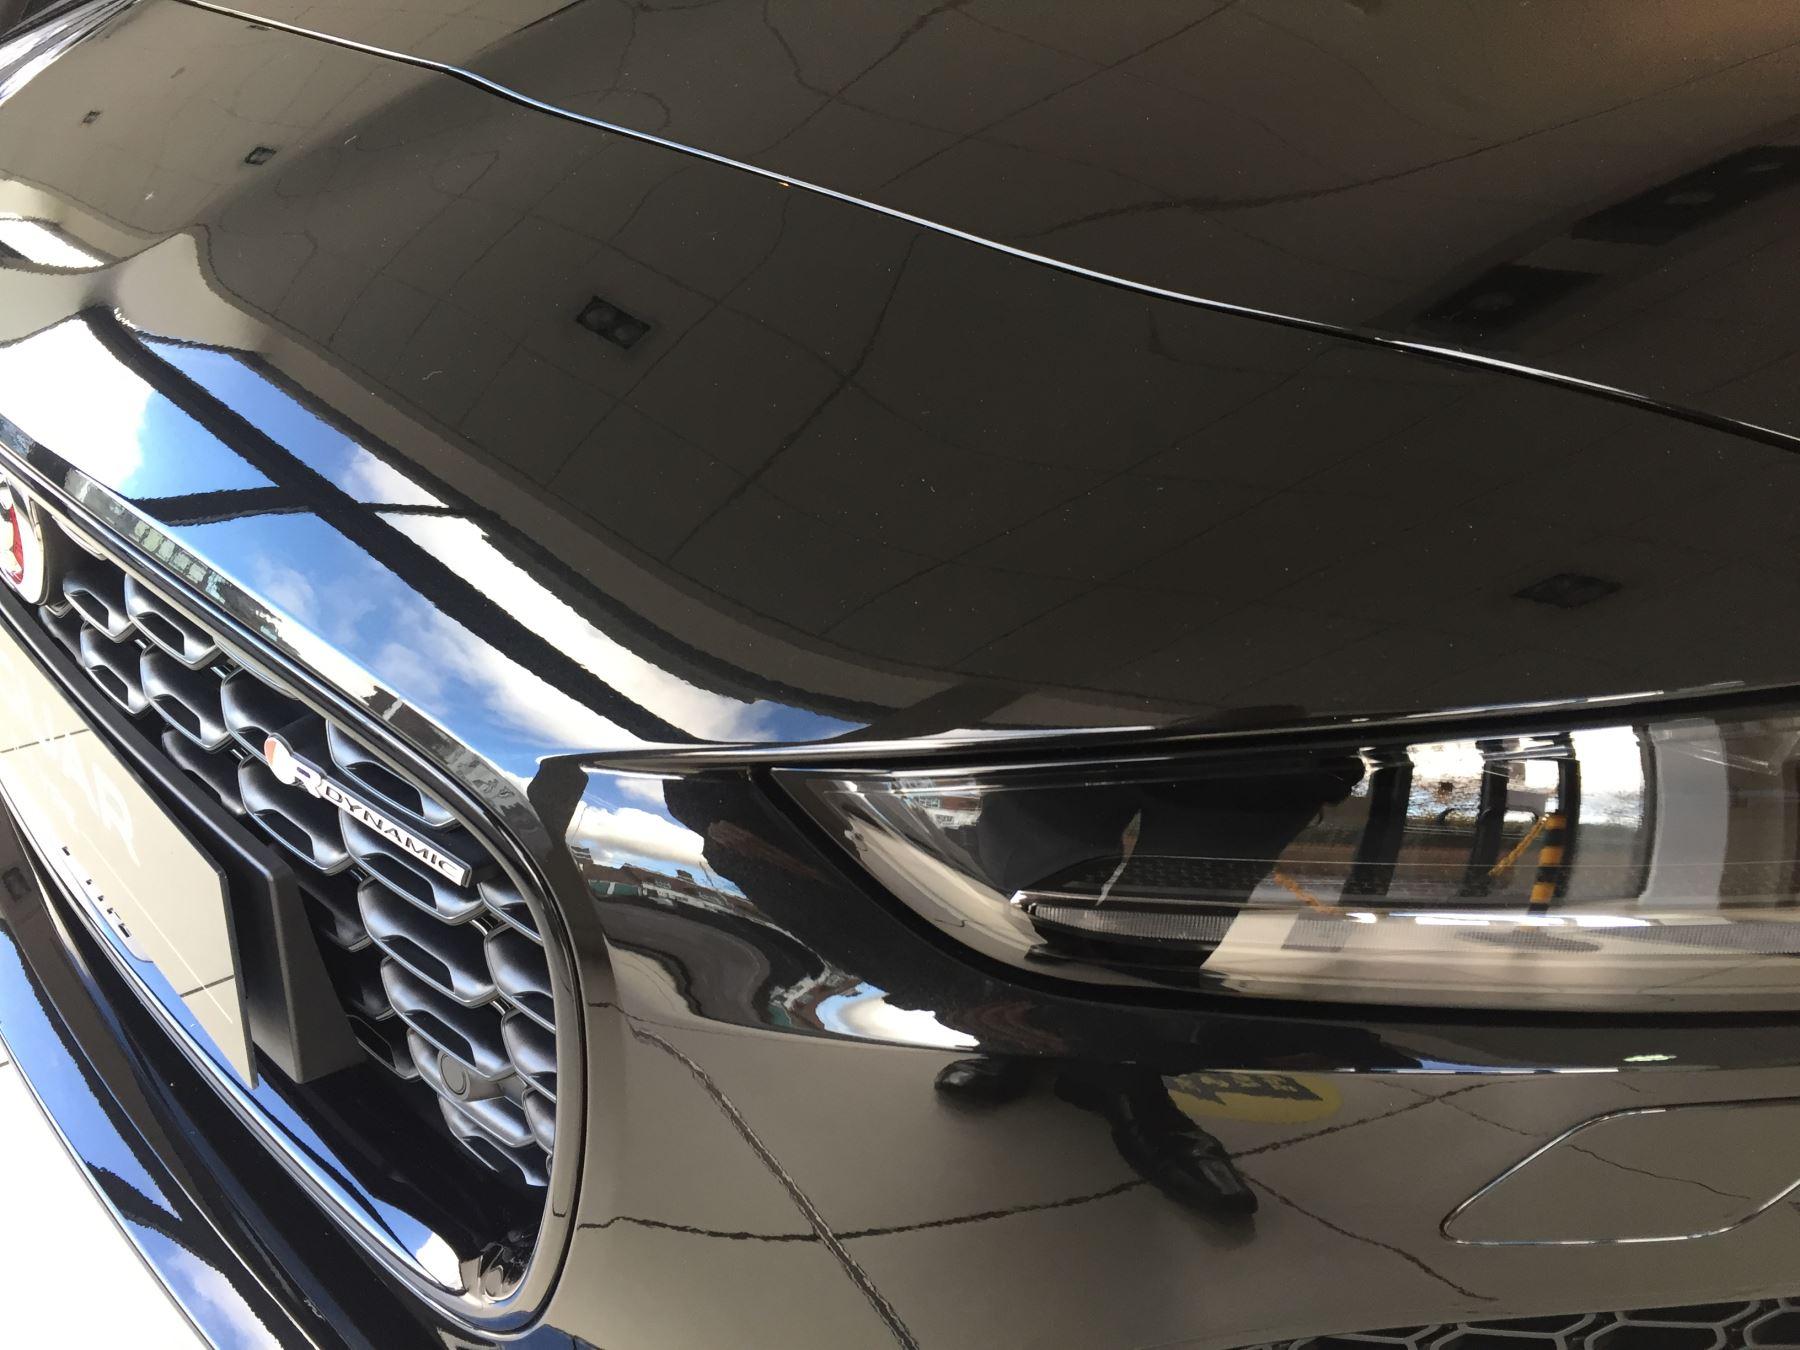 Jaguar F-TYPE 5.0 P450 Supercharged V8 R-Dynamic AWD image 3